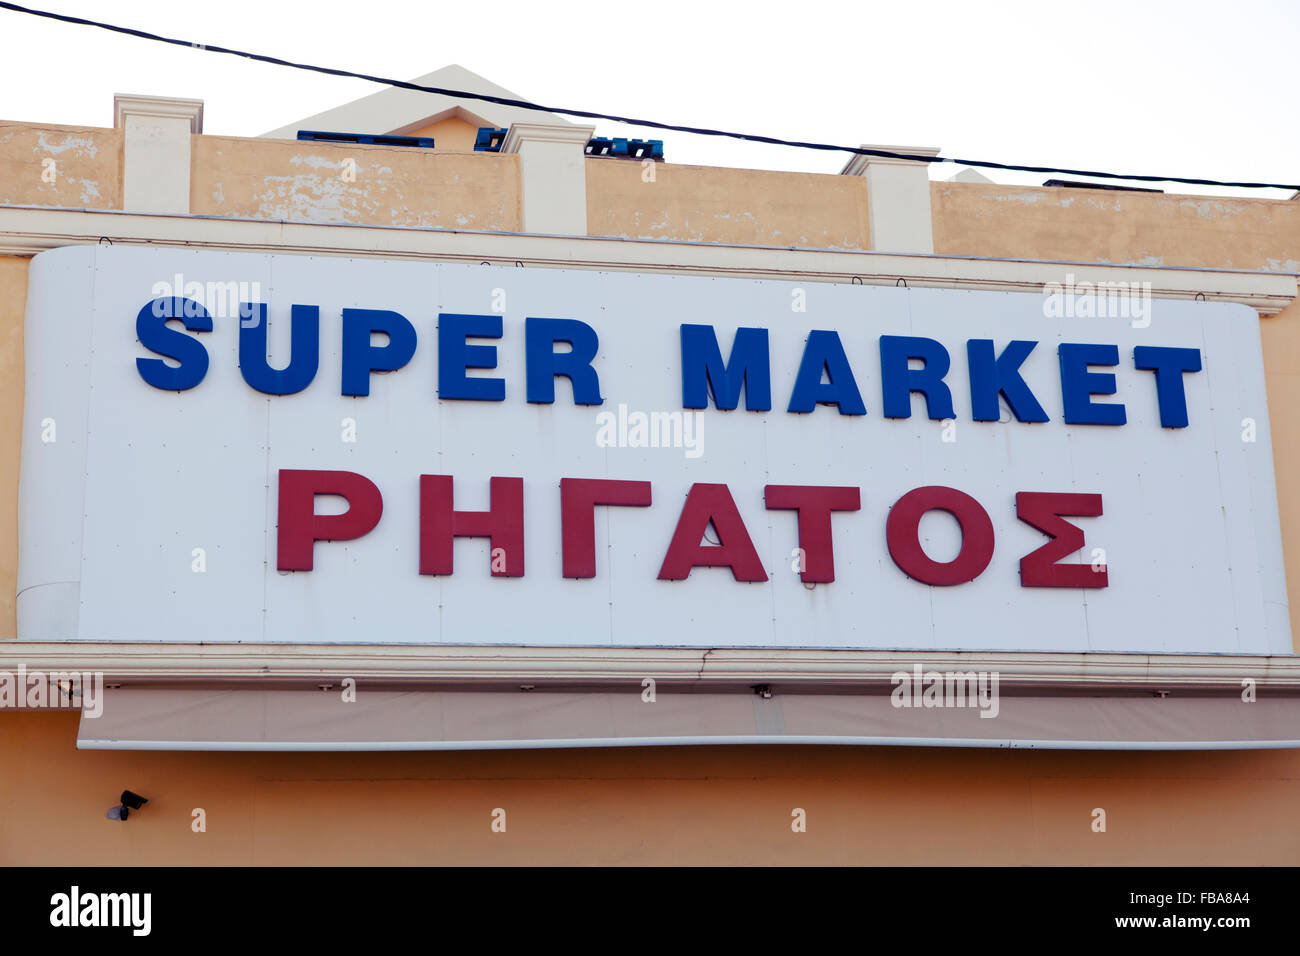 Super market sign, Greek language underneath - Stock Image